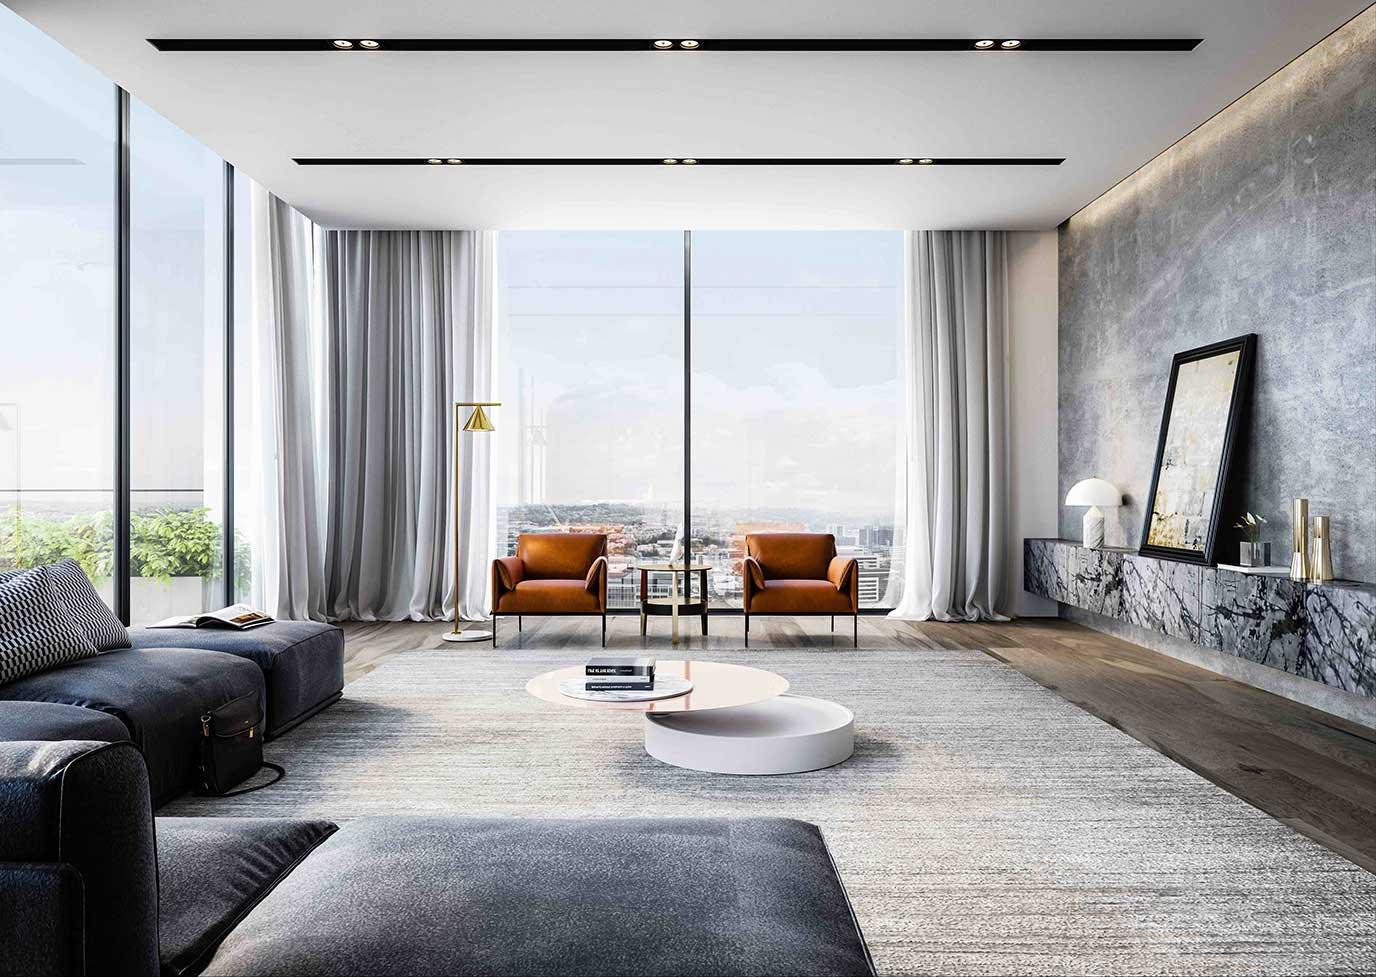 St Pauls Terrace modern apartment interior views